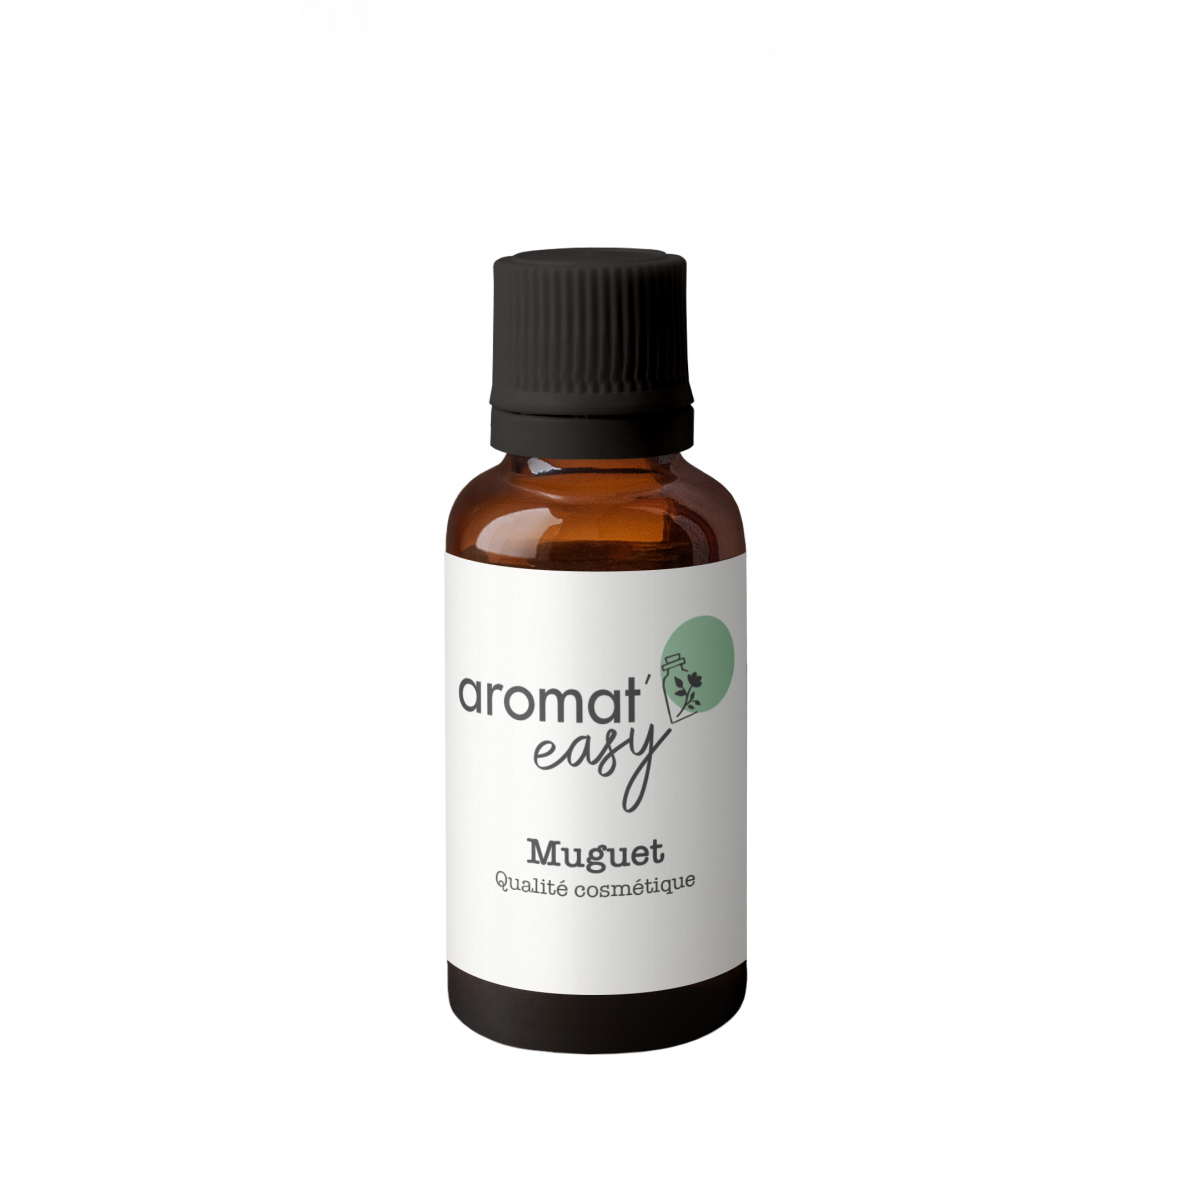 Fragrance Muguet